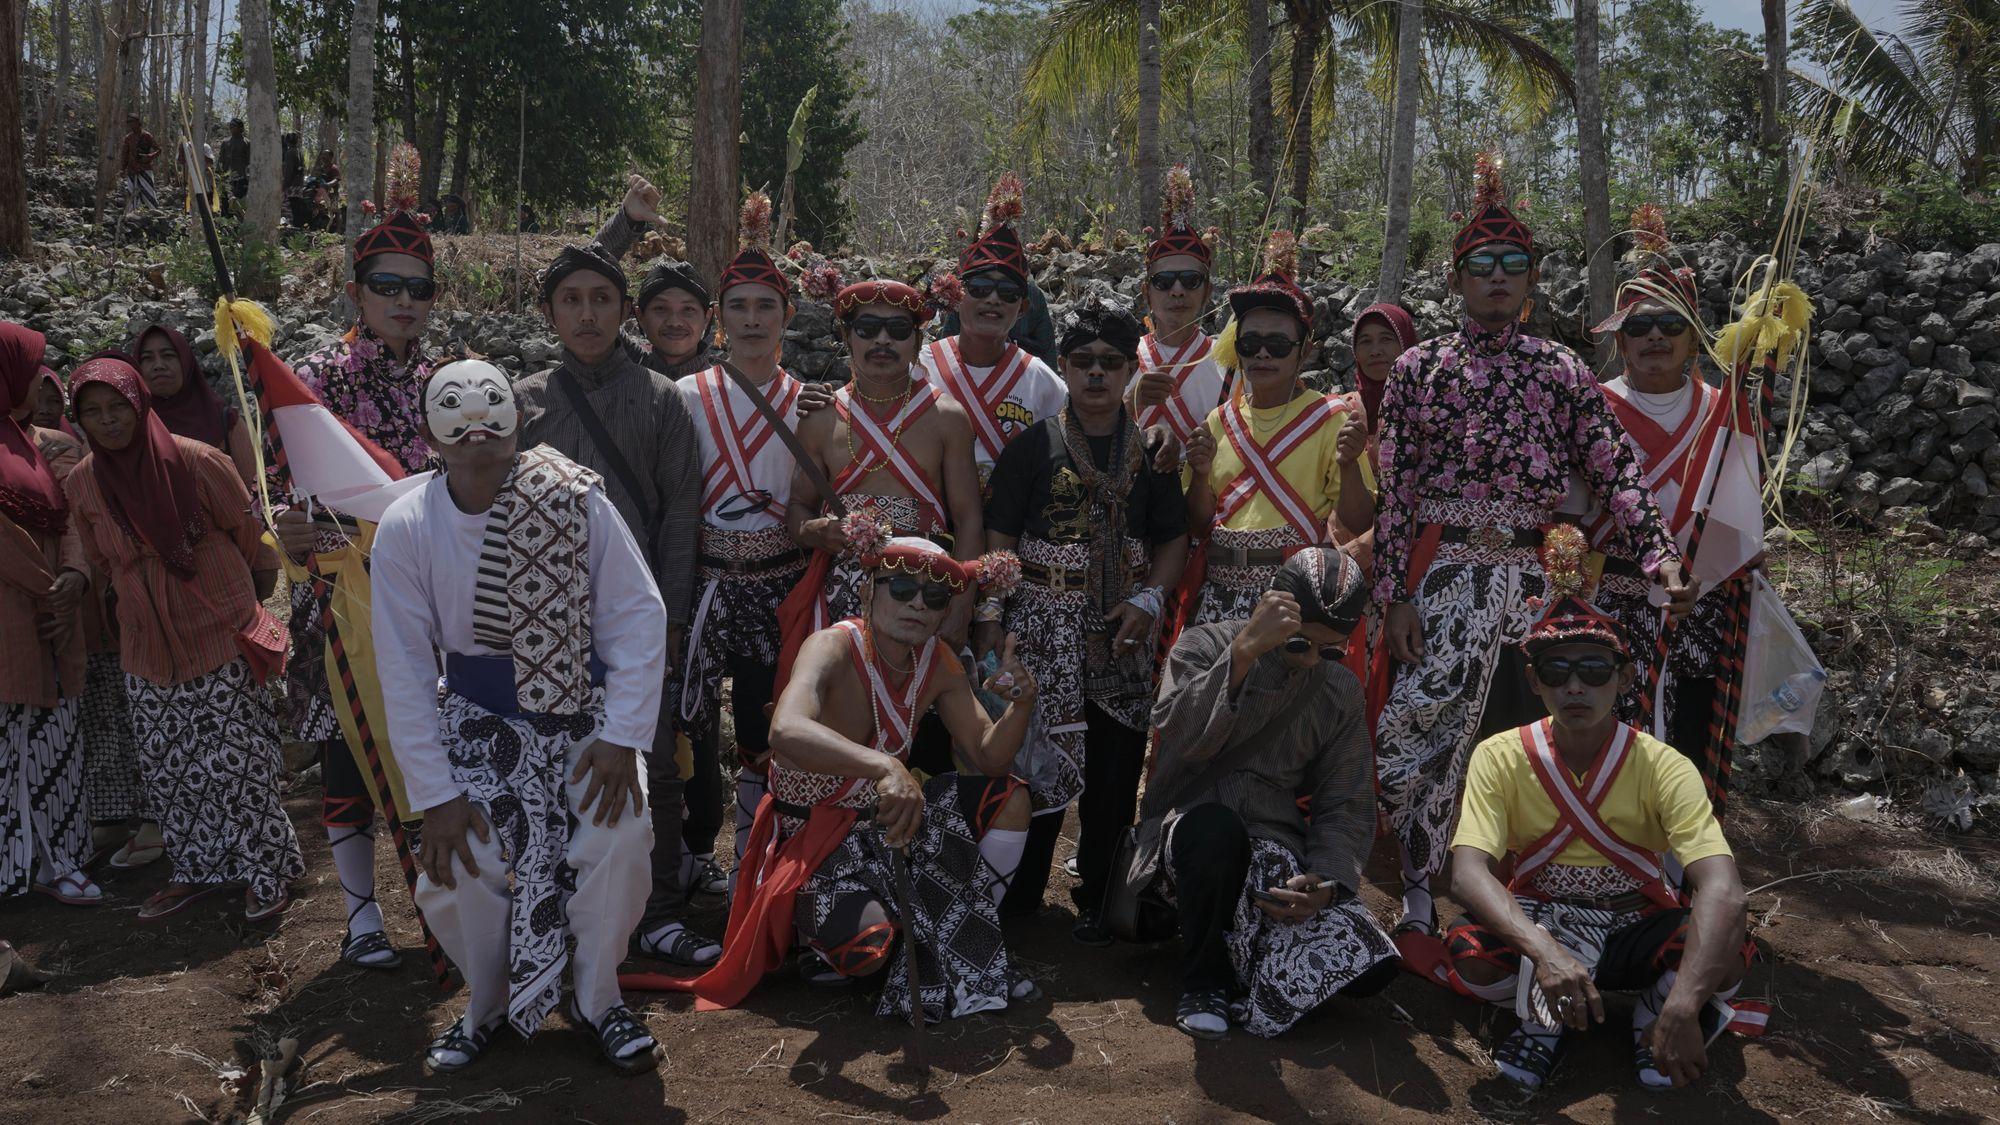 Pageblug dan Ritus Tolak Bala di Jawa